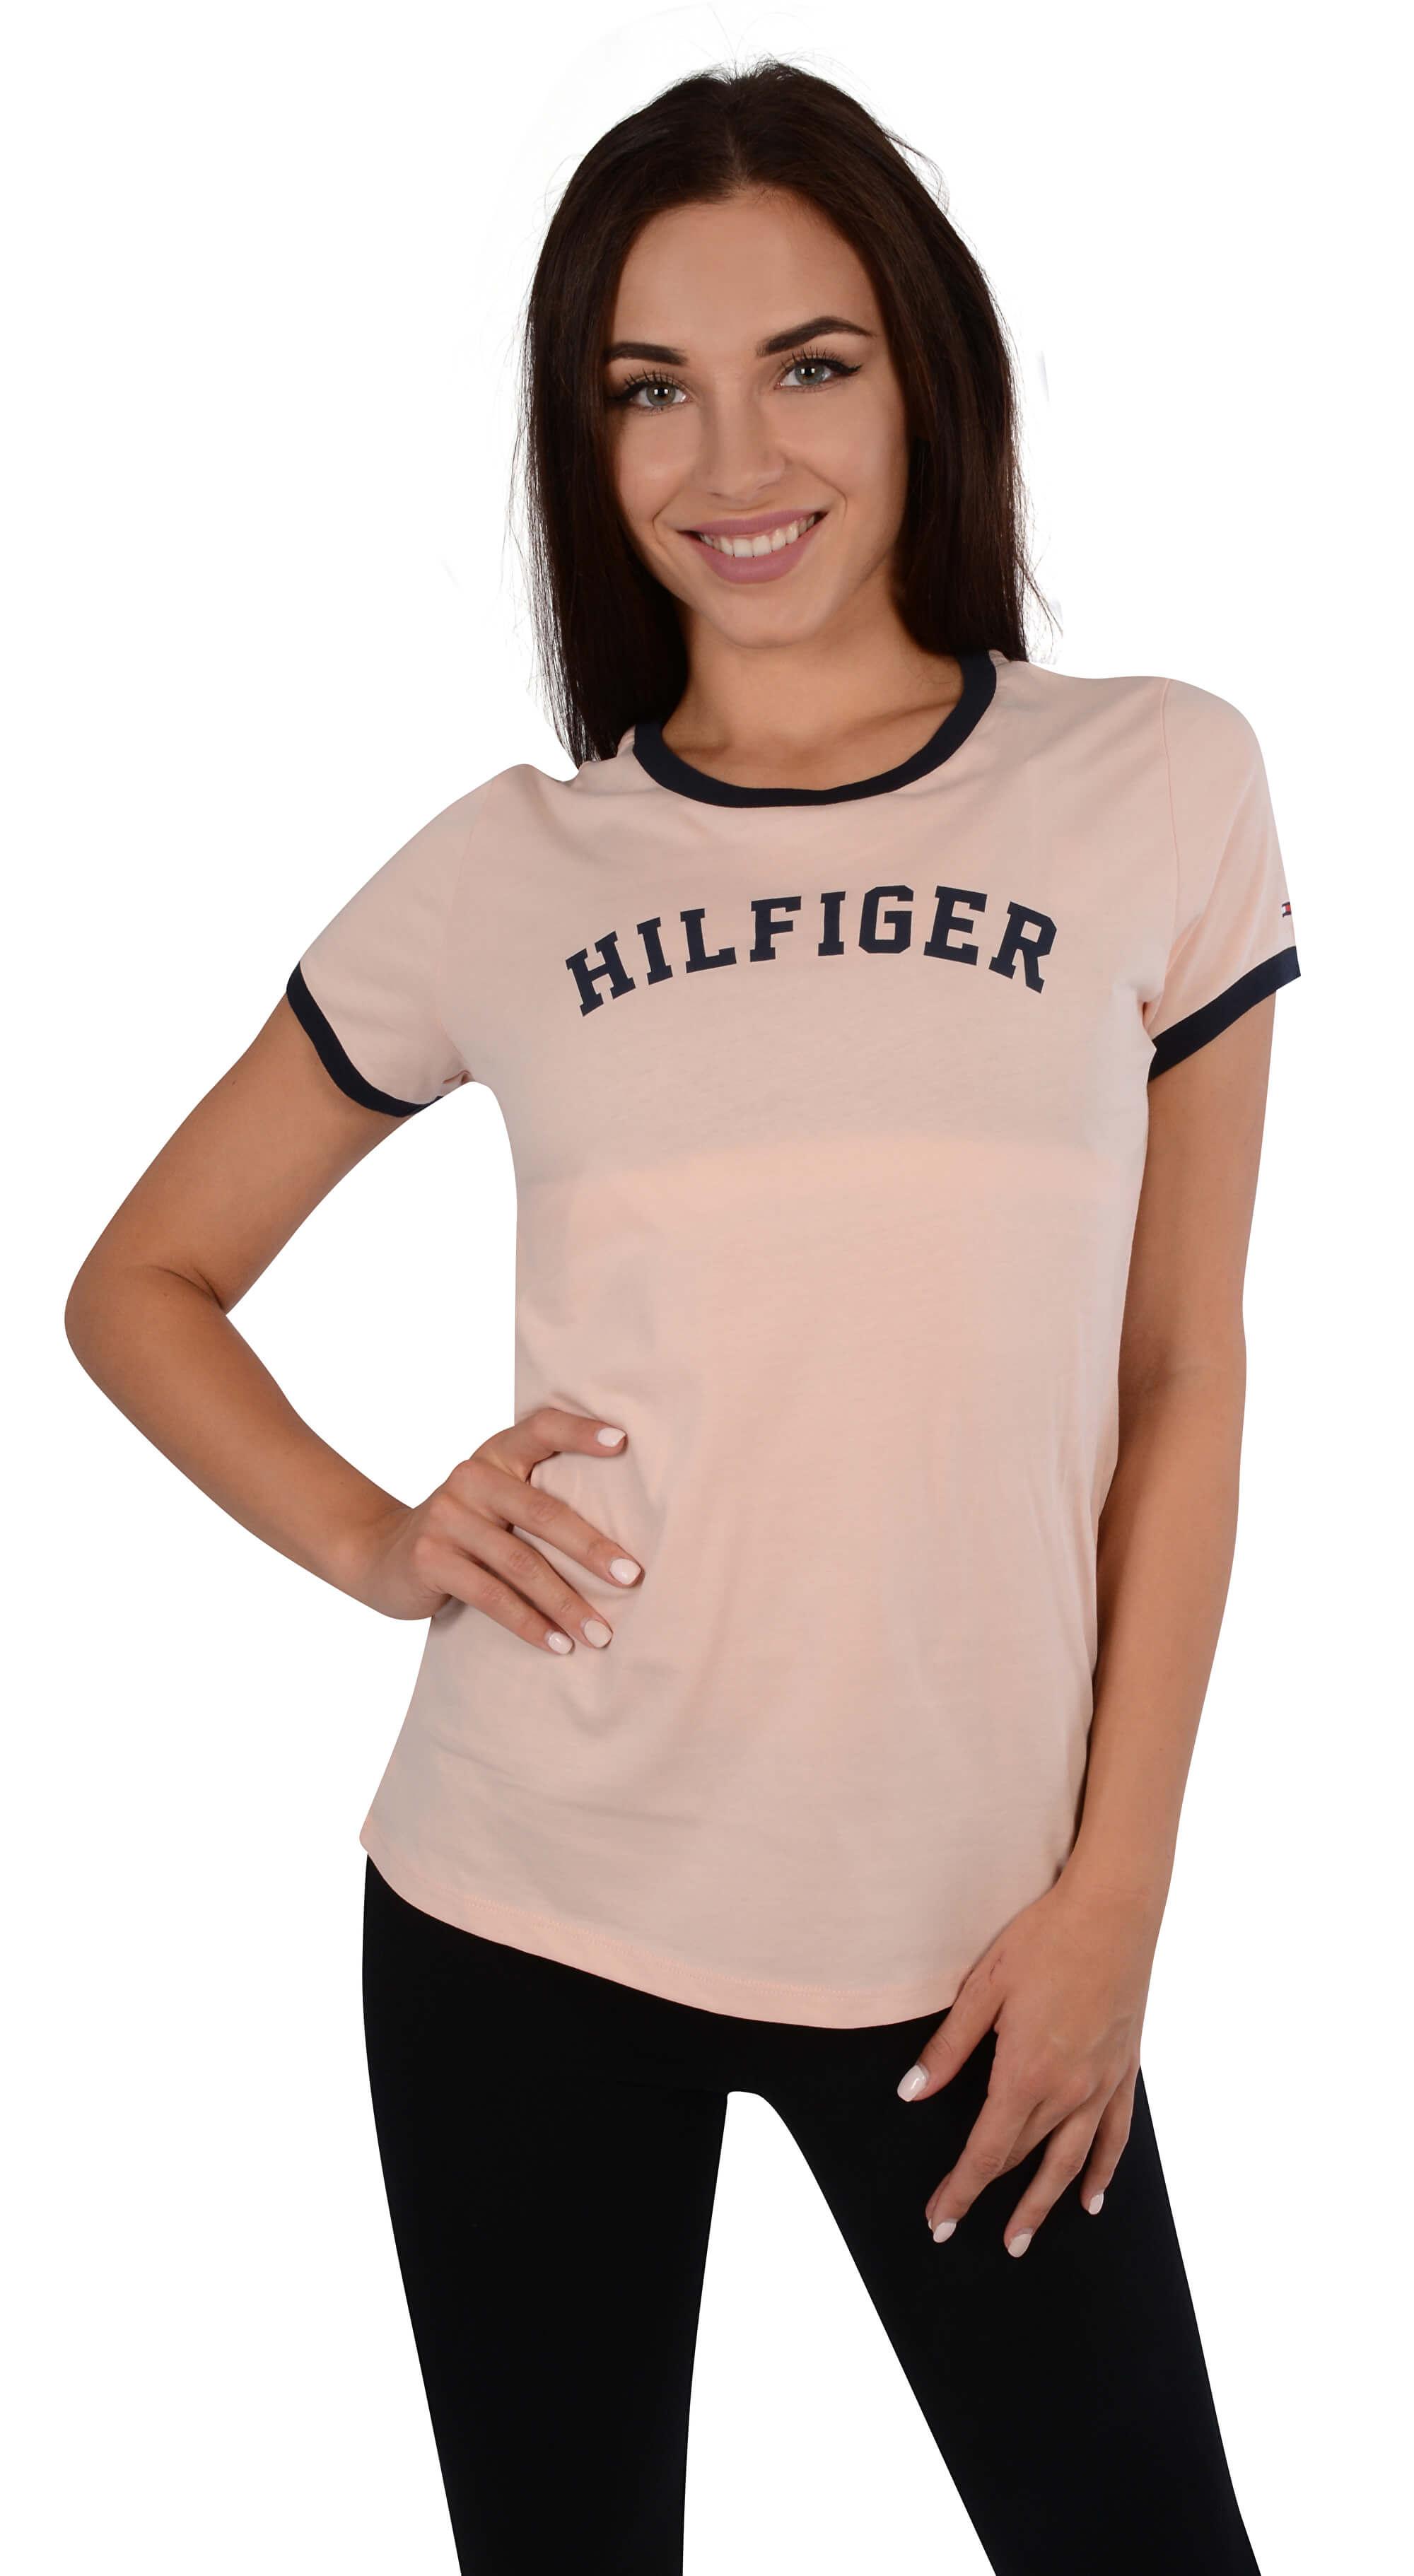 f556ac55810 Tommy Hilfiger Dámské triko Bold Cotton Iconic Ss Tee Print Pale ...